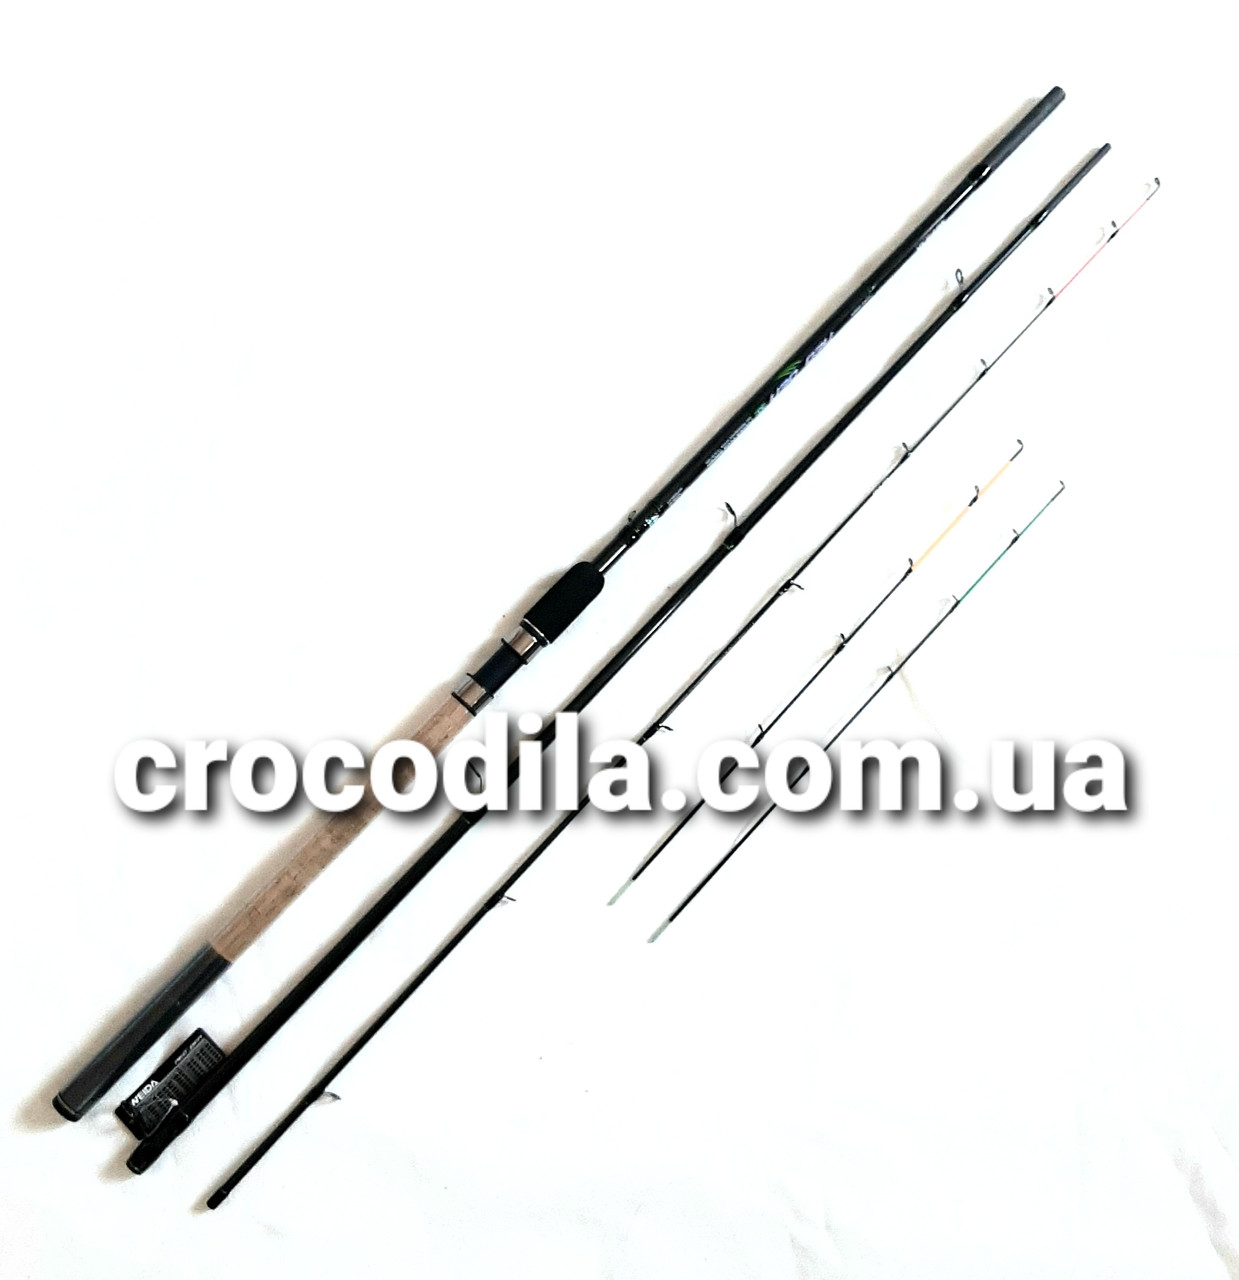 Фидерное удилище Kaida (Weida)  NeoXoen 3.9 m 60-120 грамм